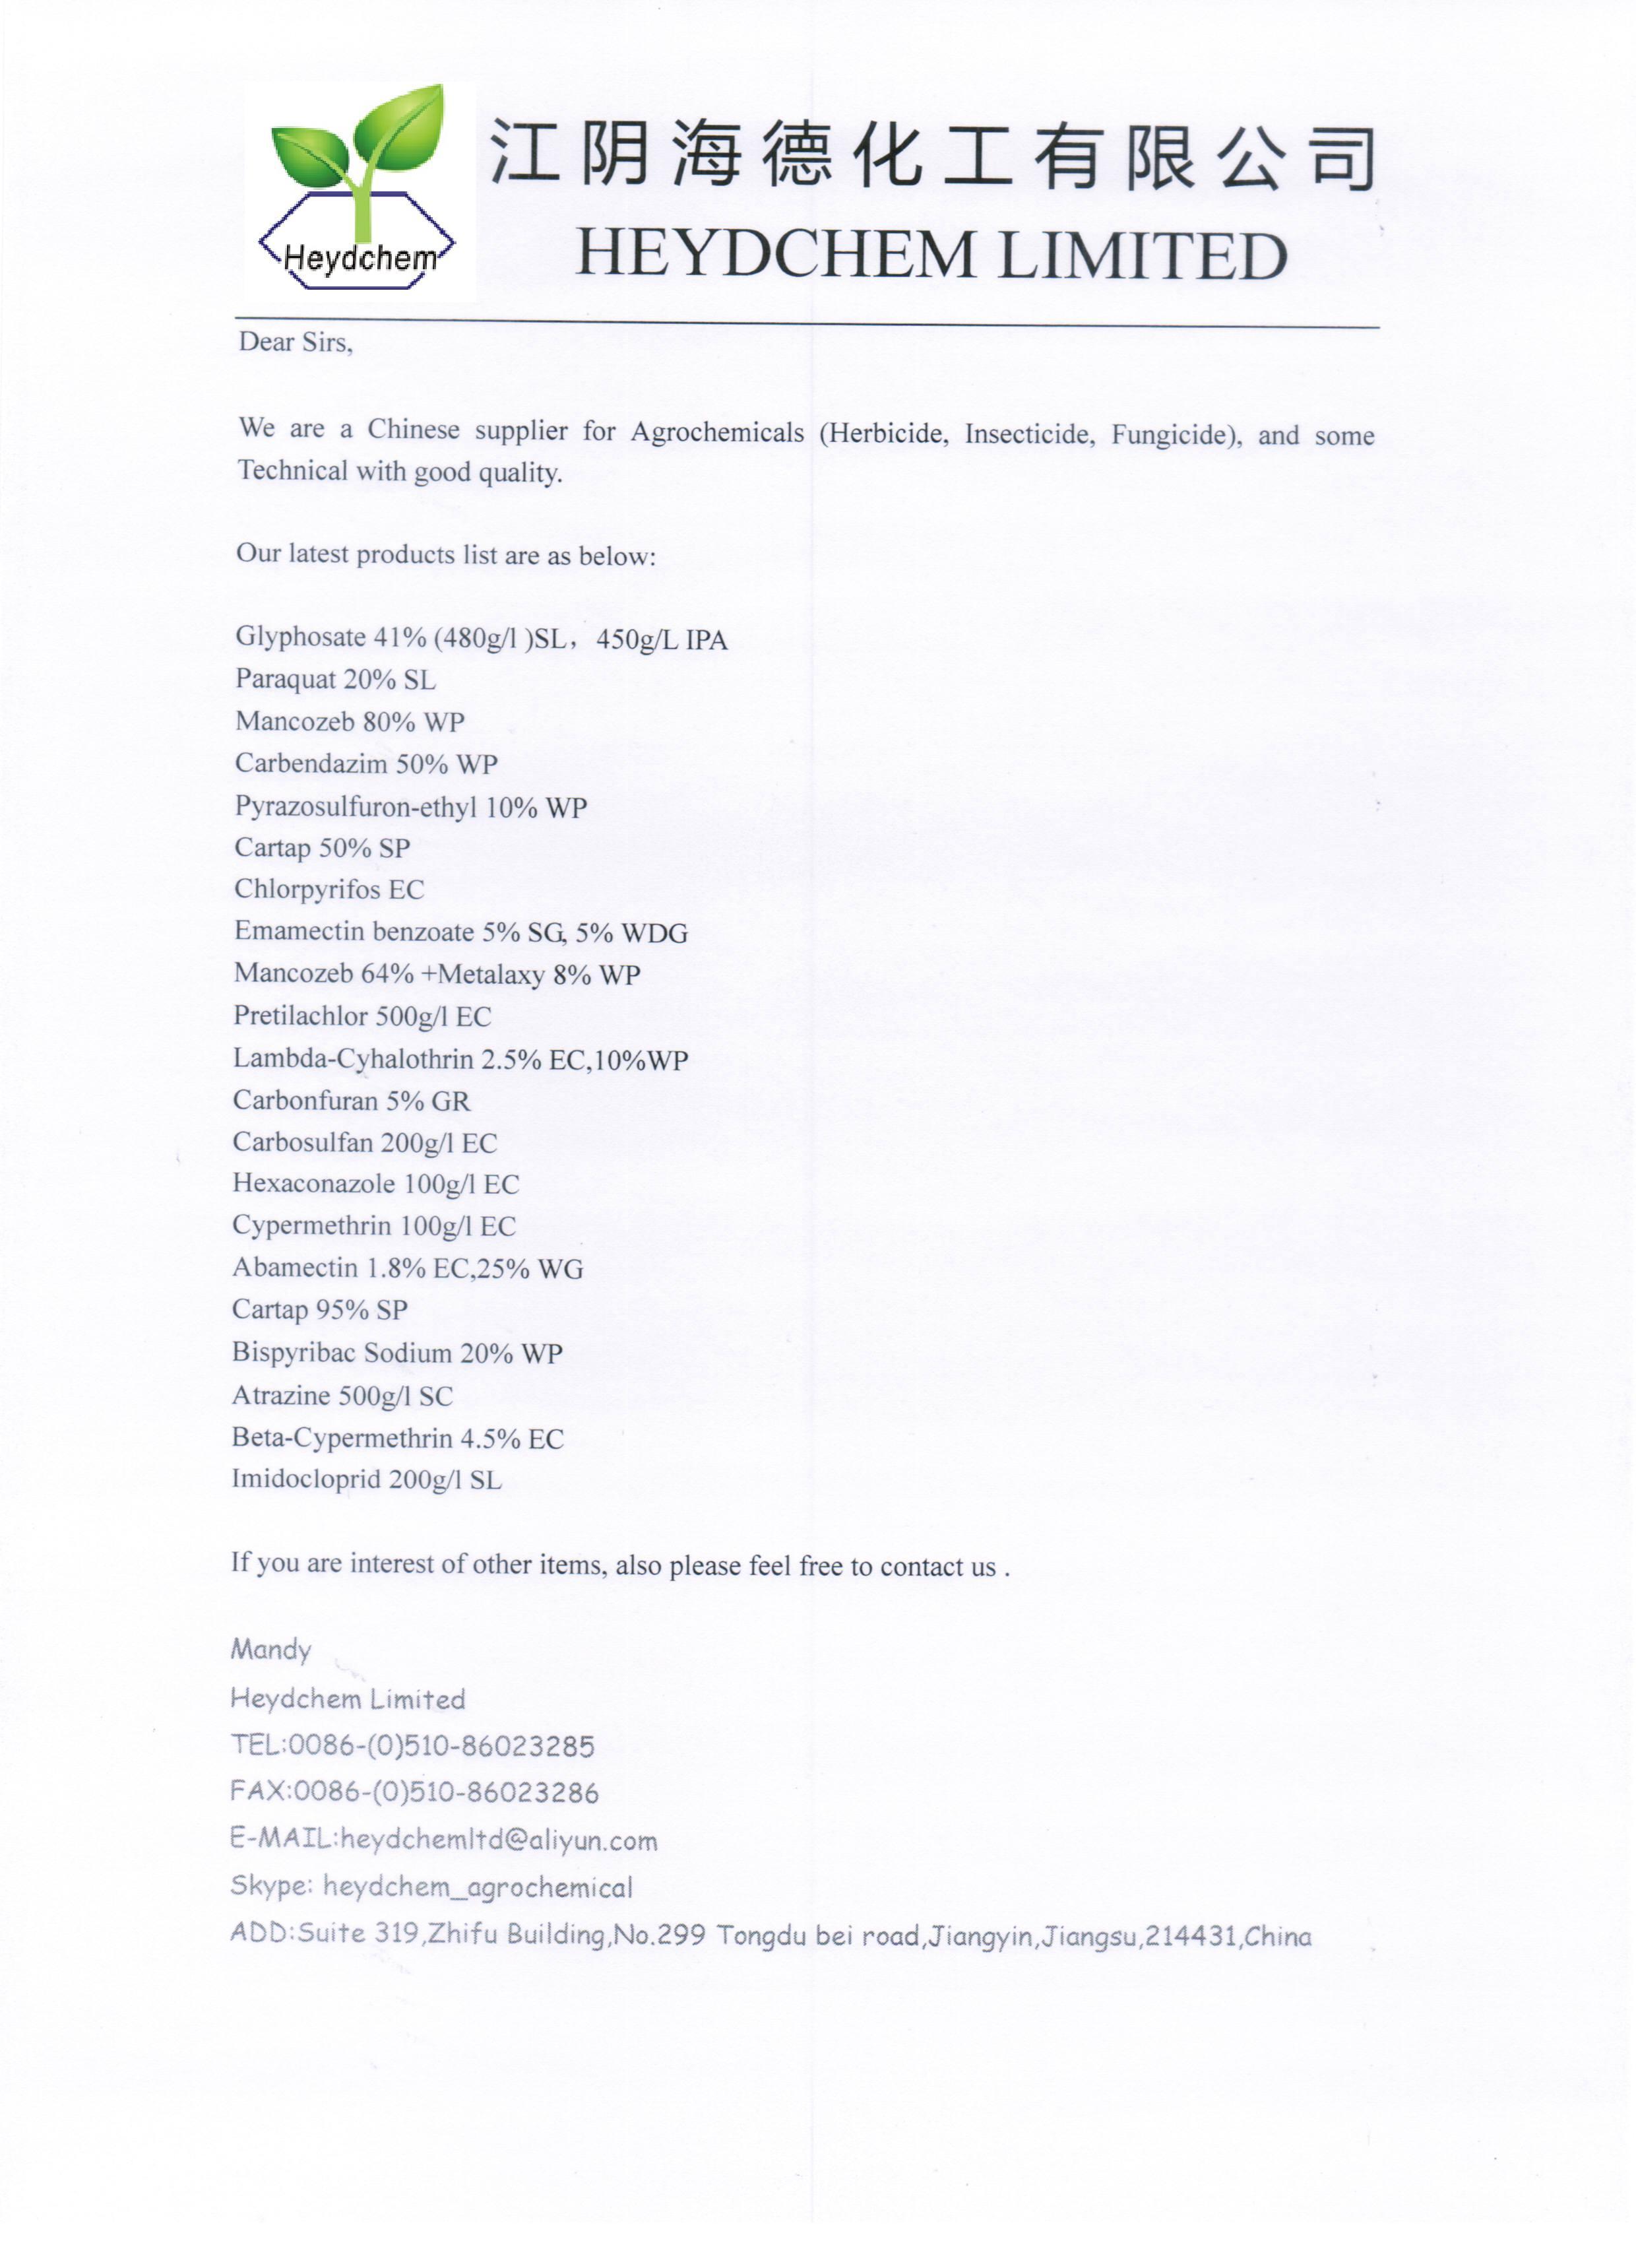 Glyphosate 450gL IPA